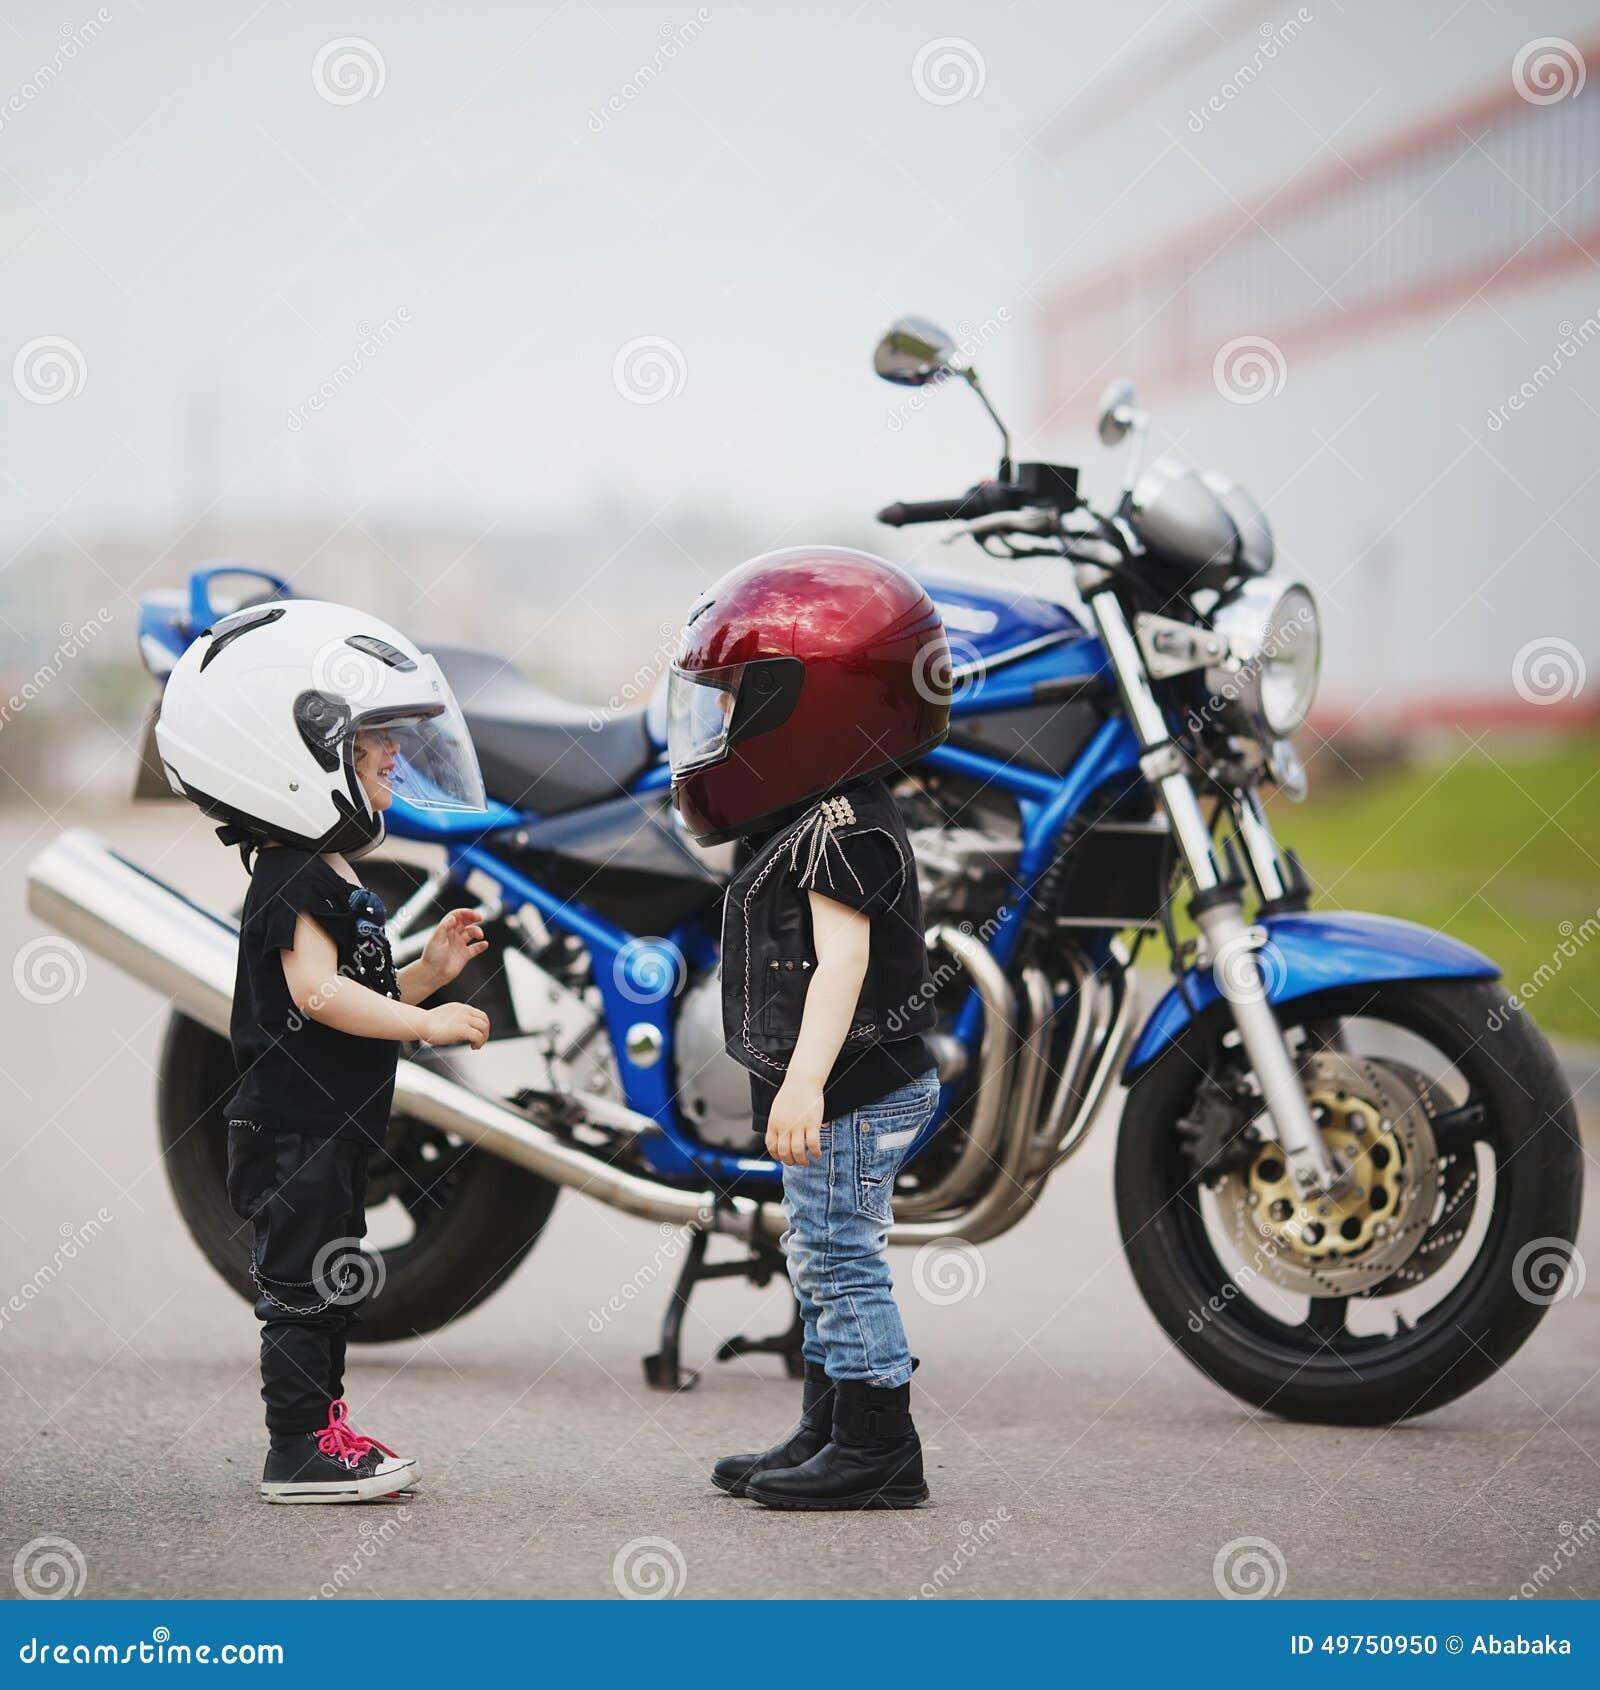 little boy on motorcycle - photo #18